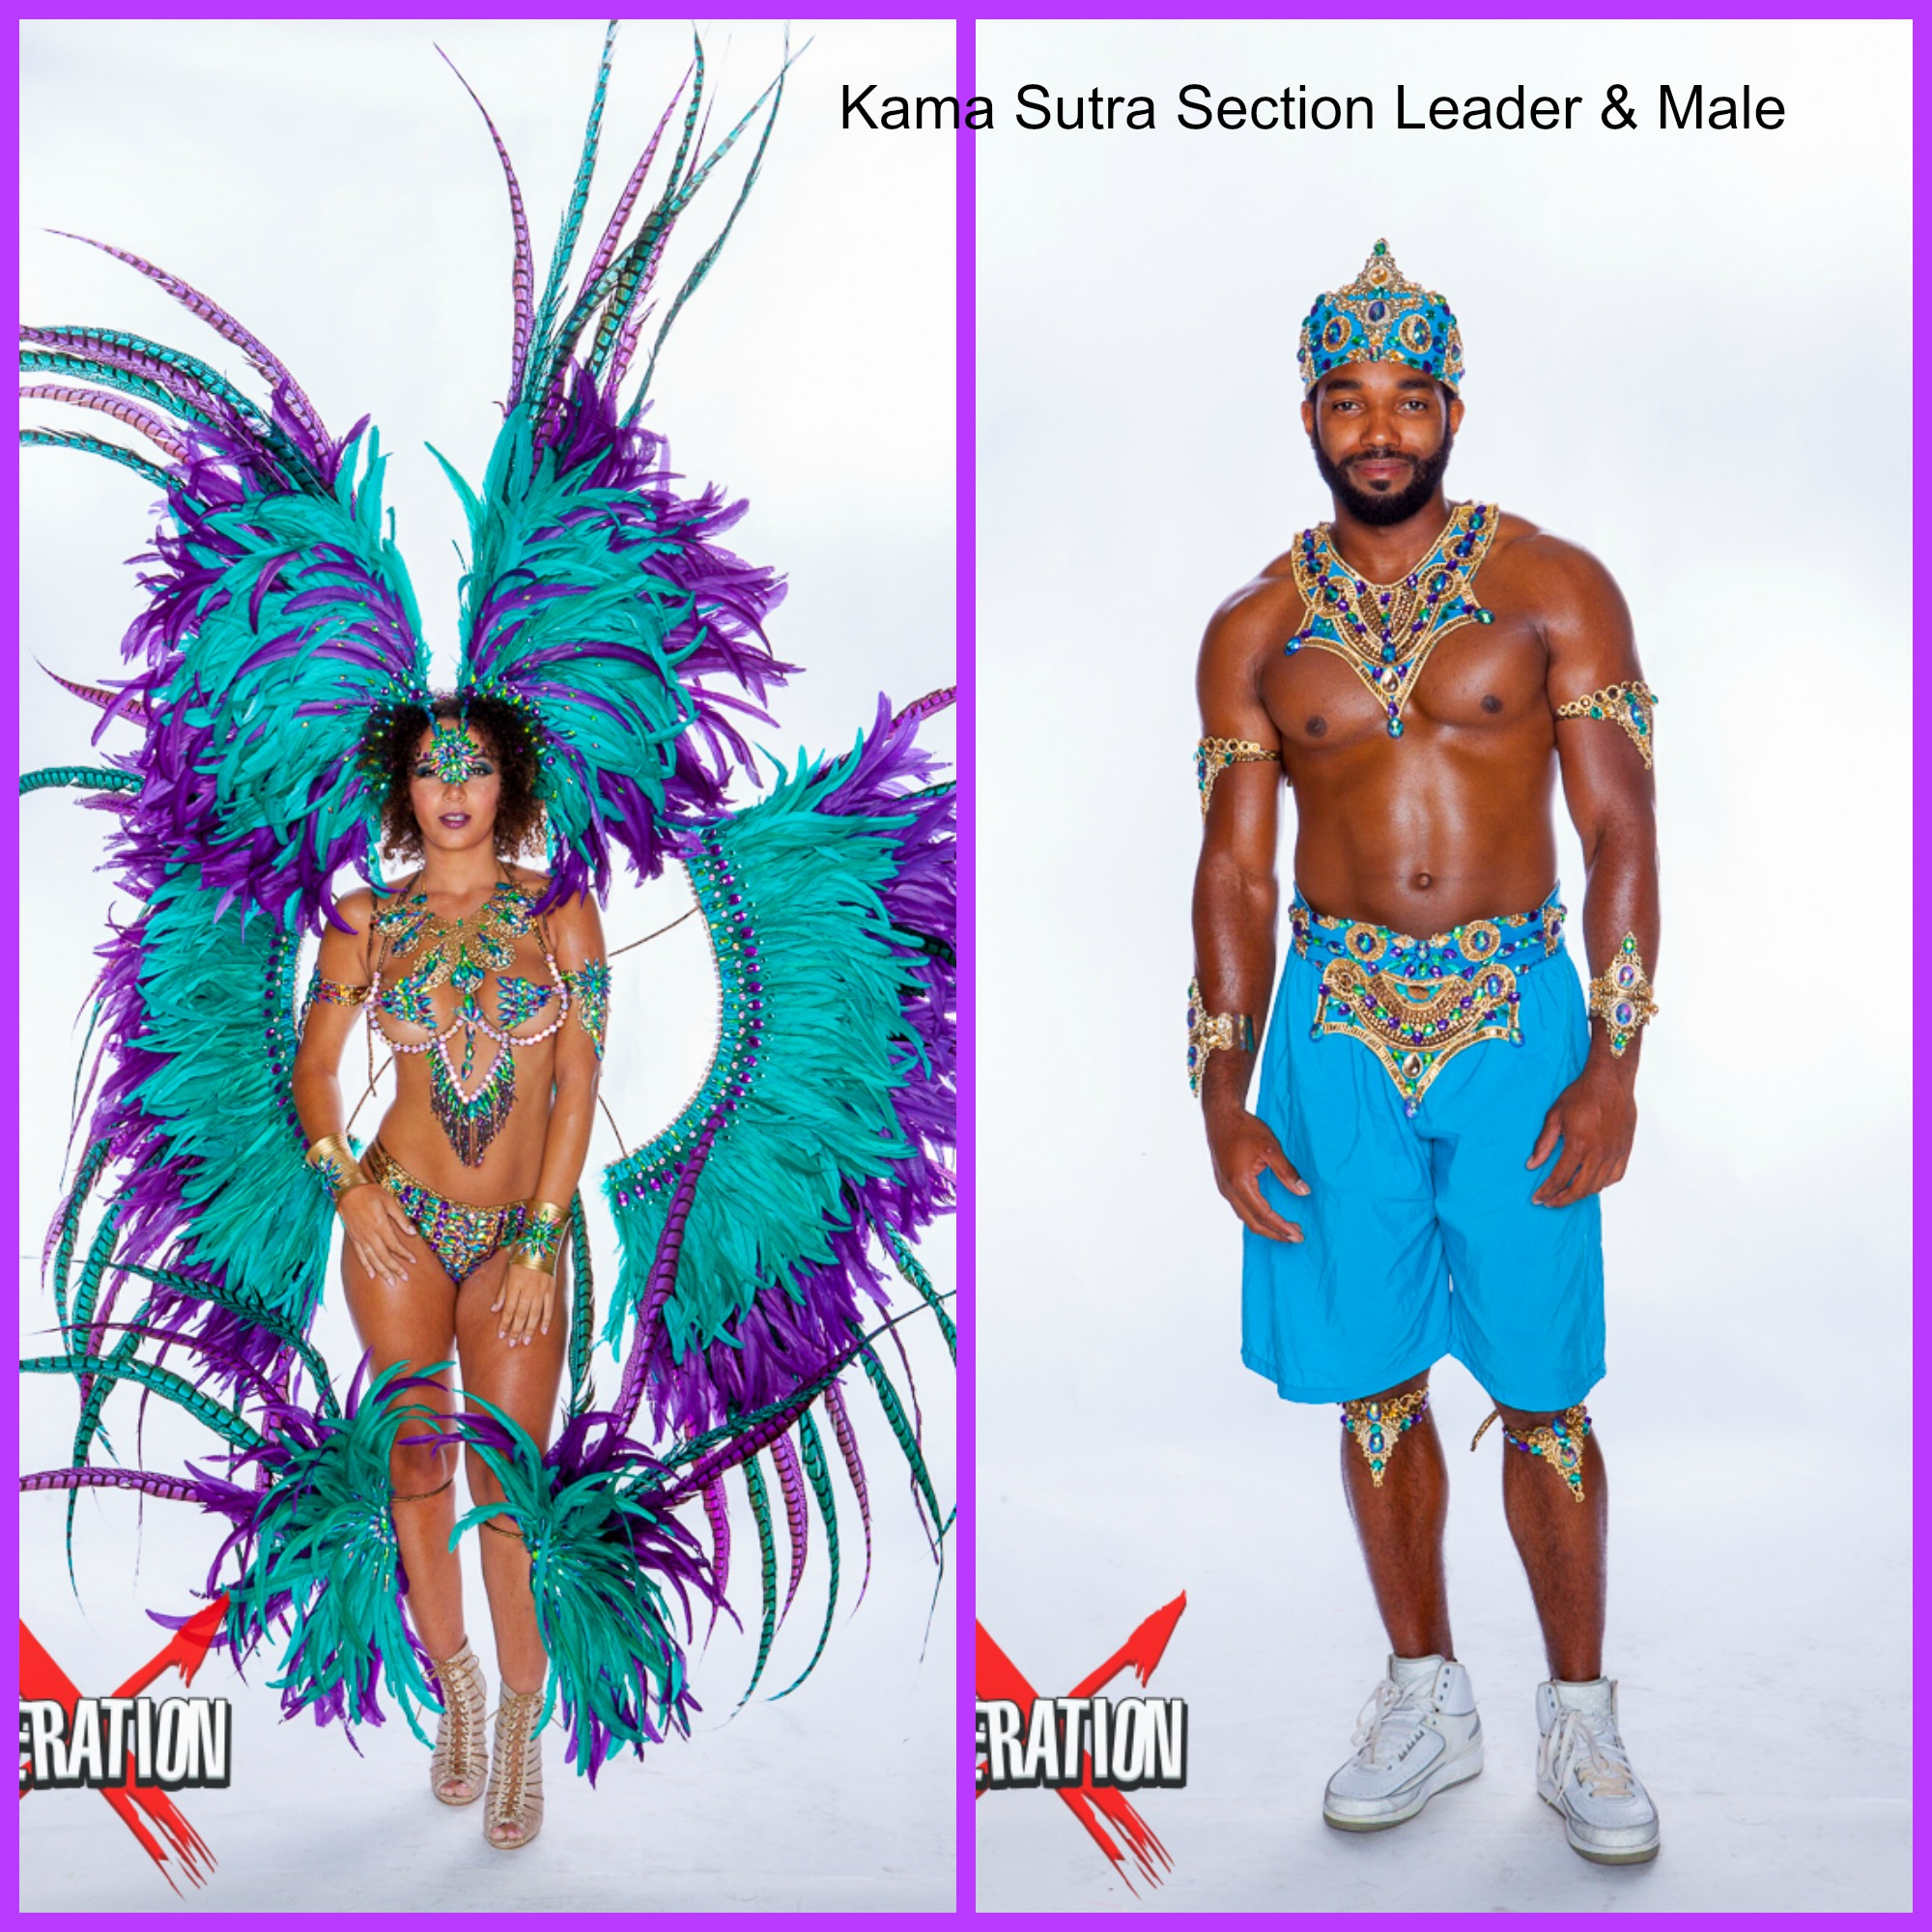 Kama Sutra SL & Male